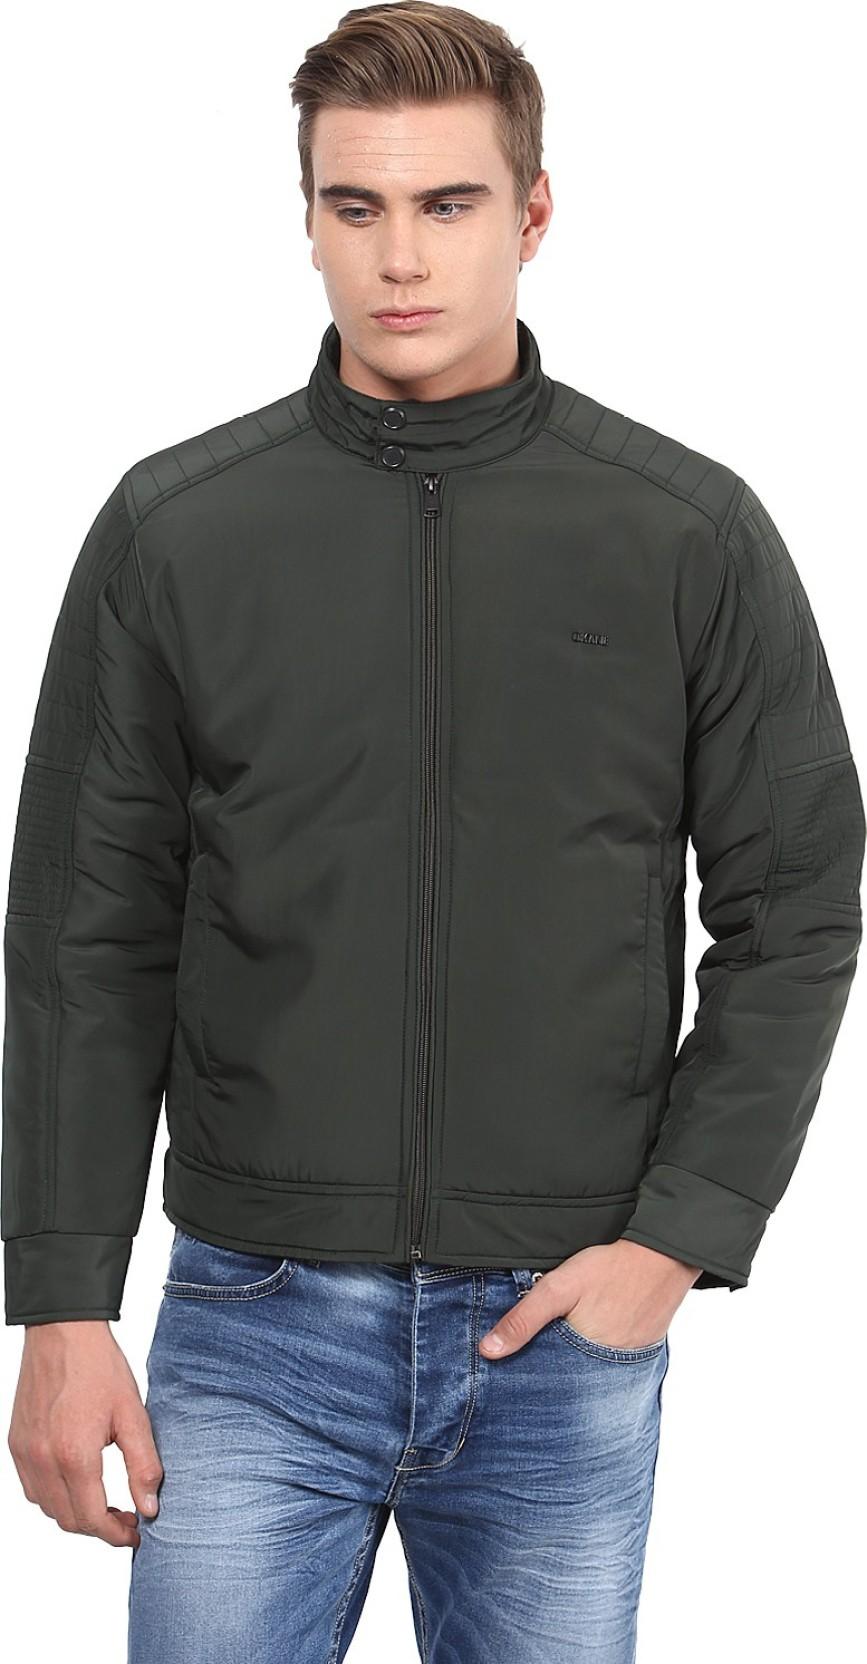 8ab49dcea Okane Full Sleeve Solid Men's Jacket